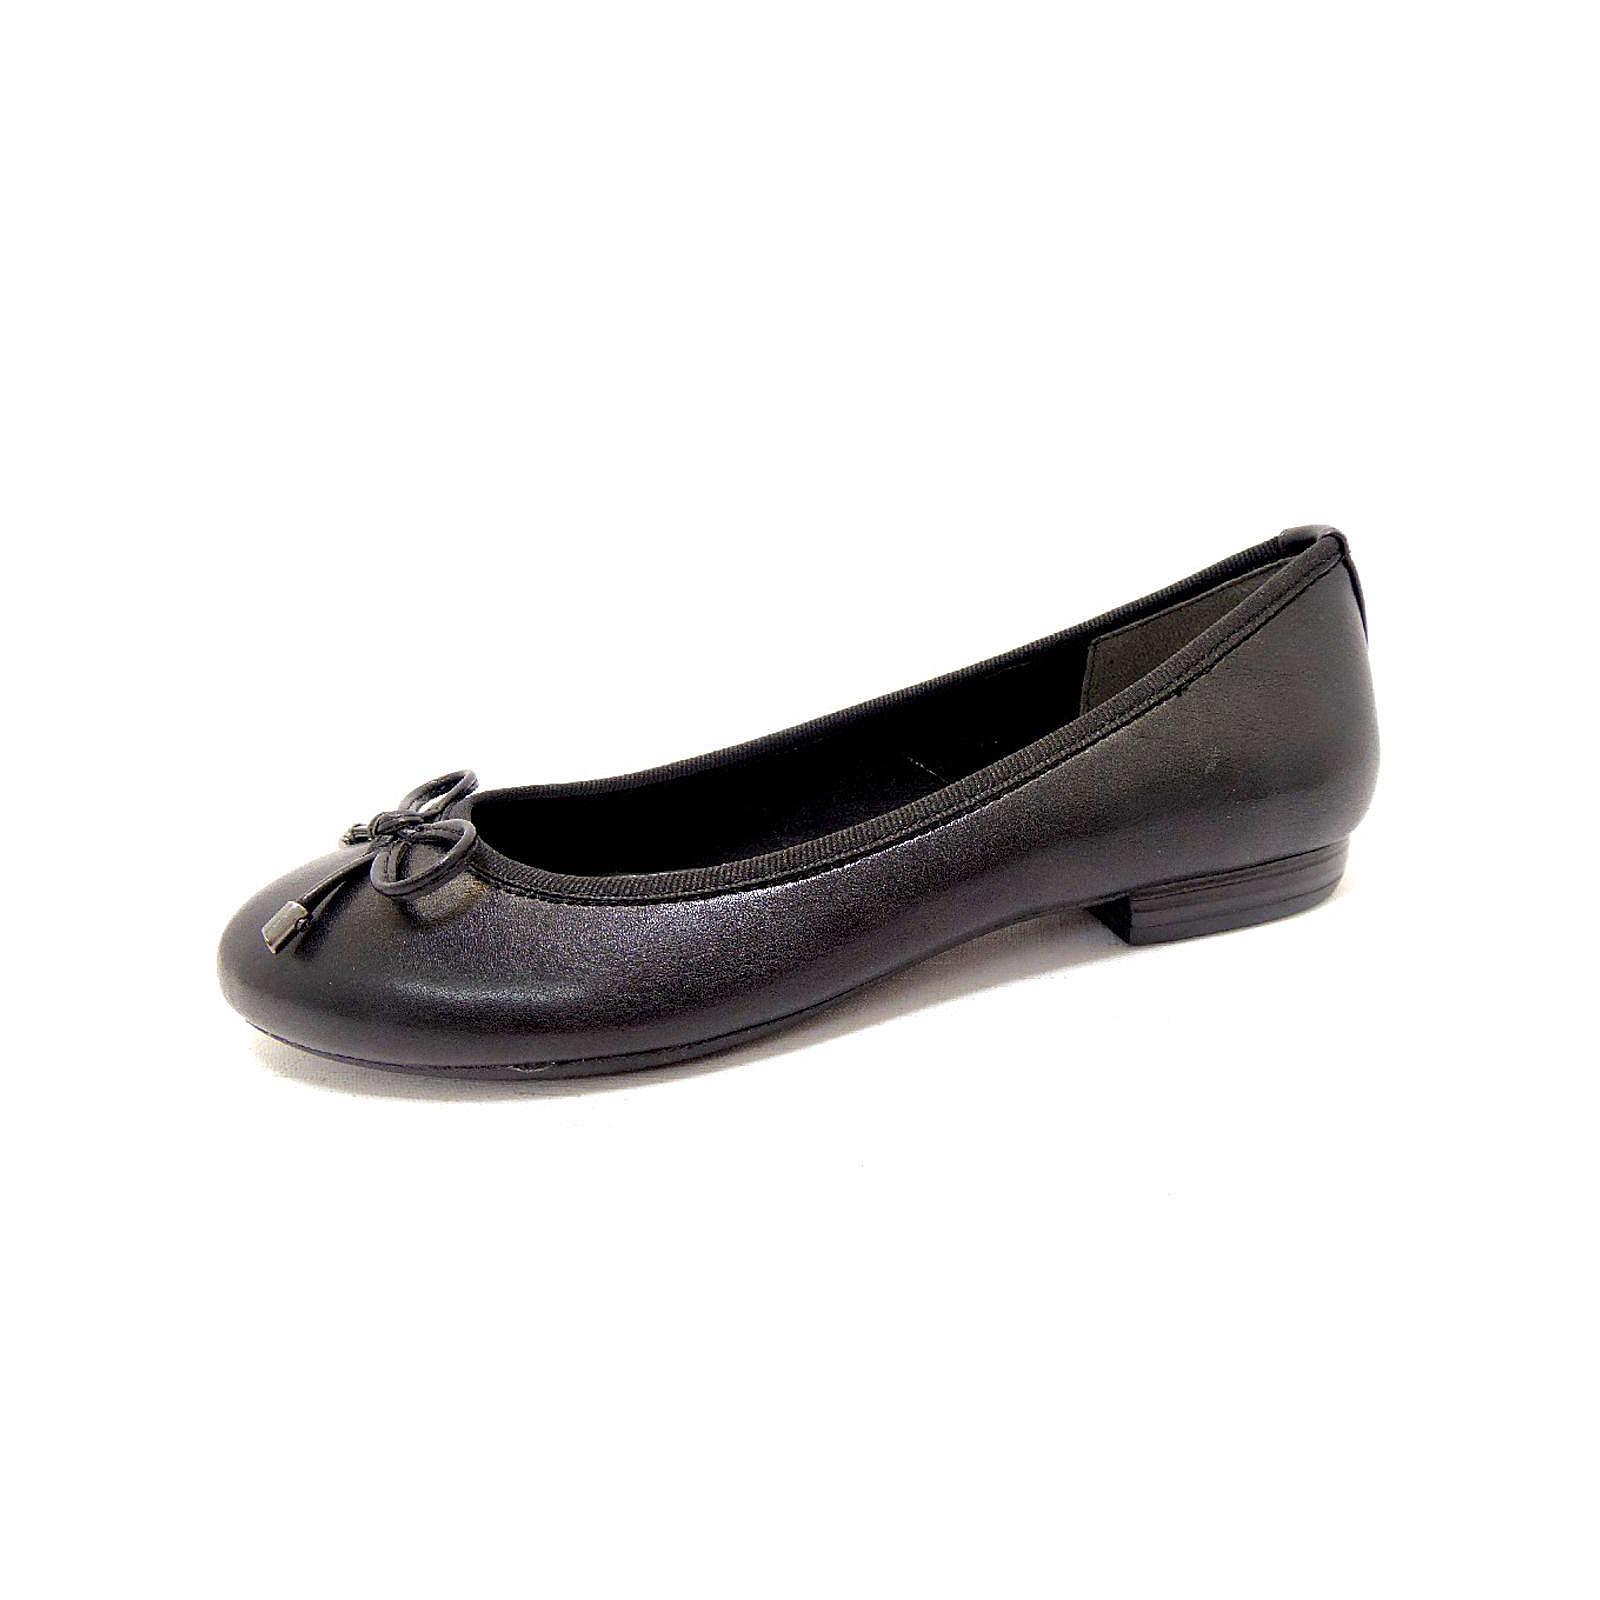 MARCO TOZZI Ballerinas schwarz schwarz Damen Gr. 39